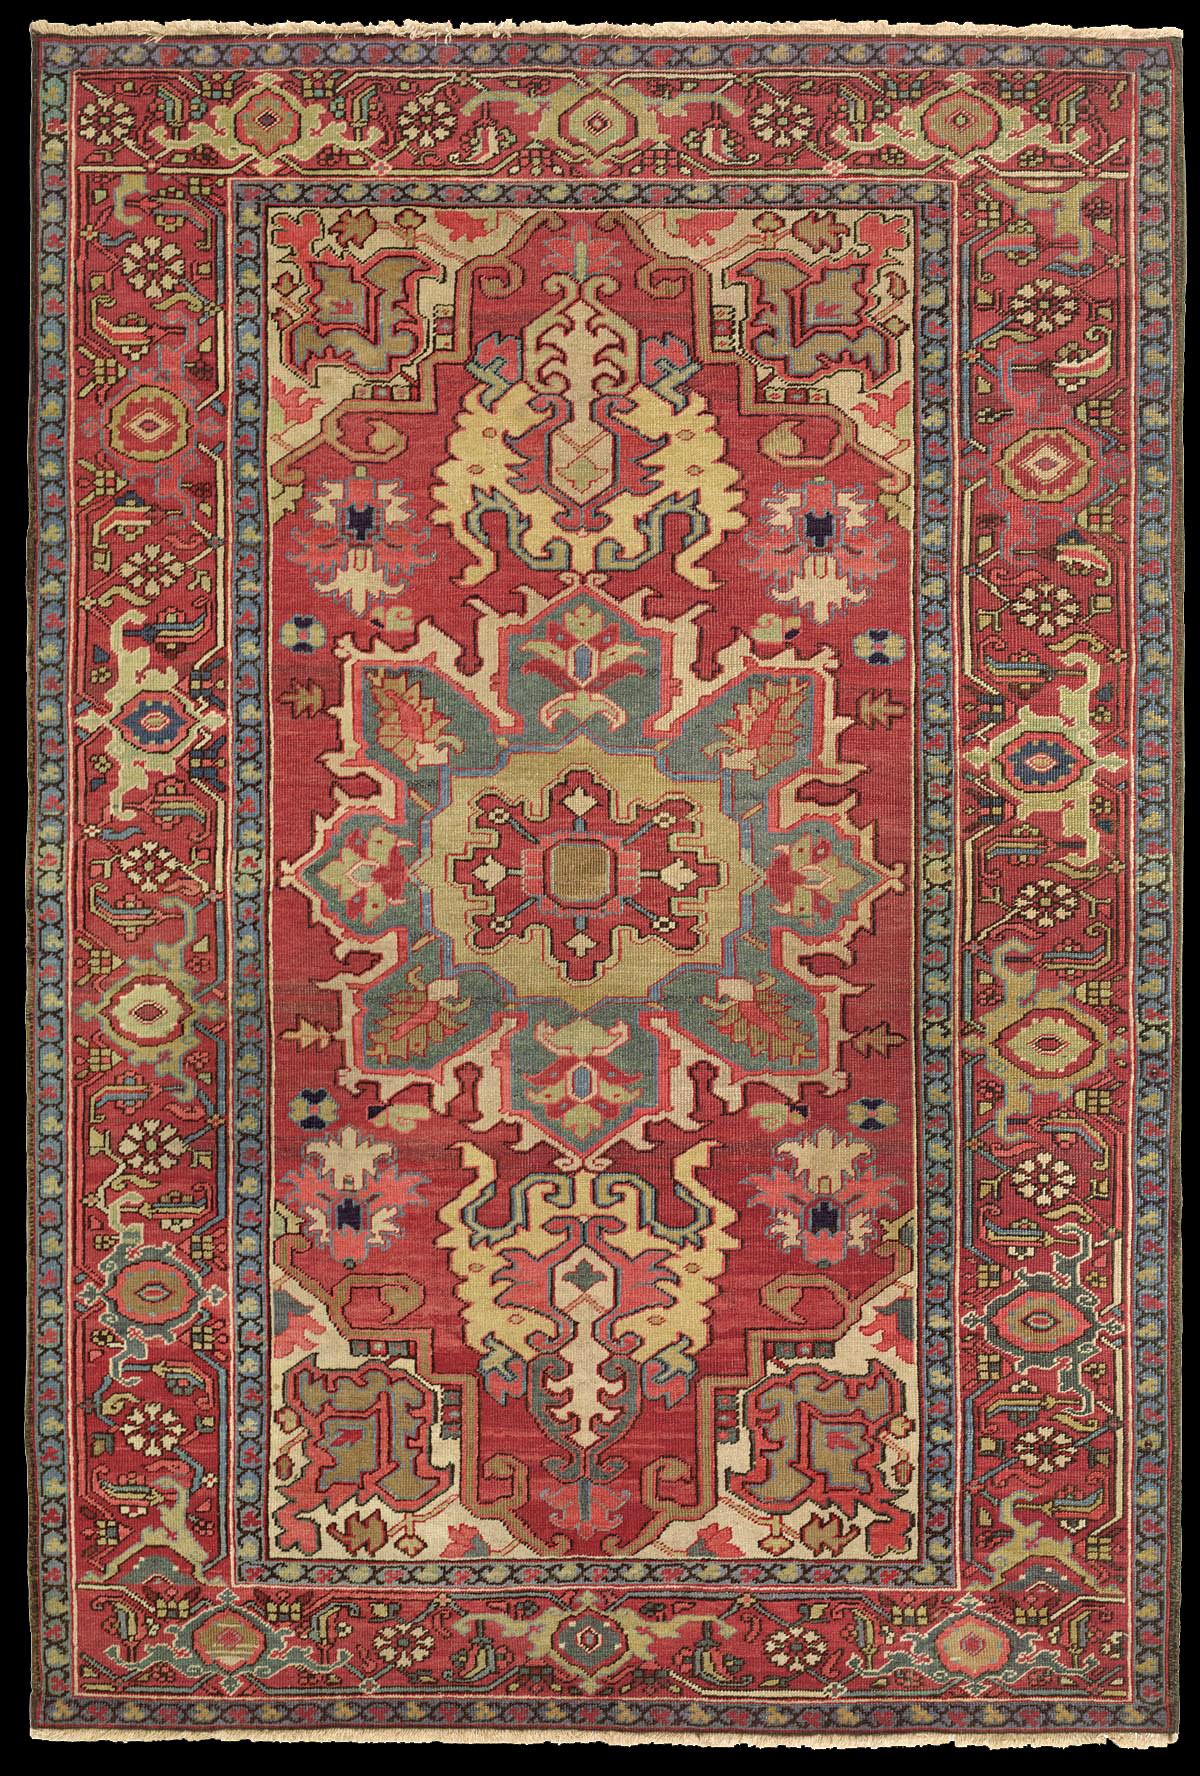 Antique Serapi Rug Azerbaijan Nw Iran 19th Century 4 39 6